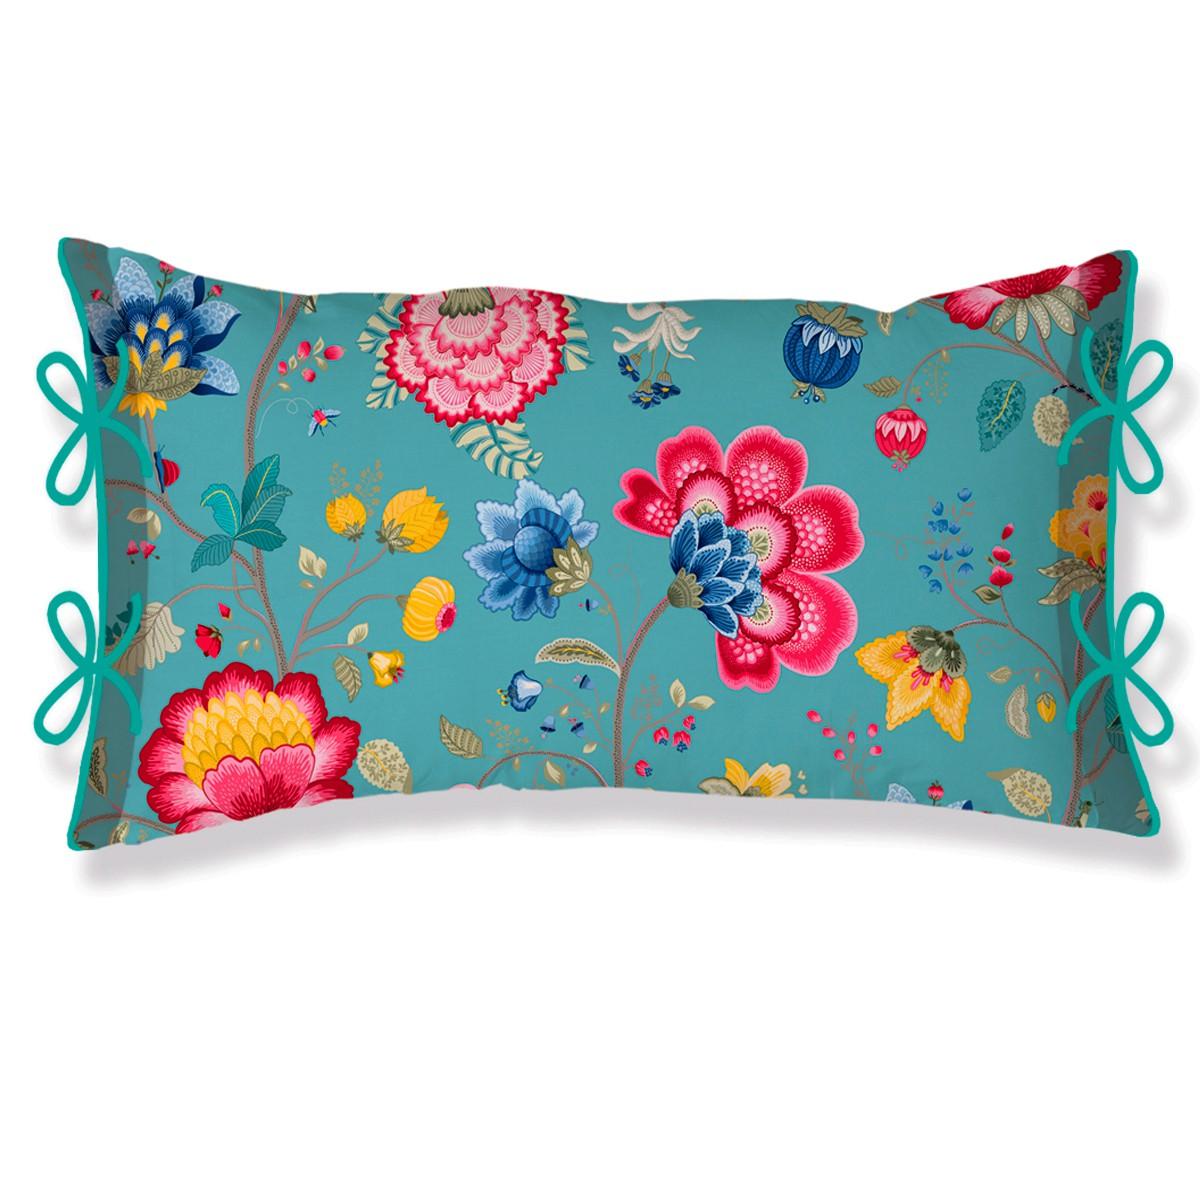 pip kissen zierkissen floral fantasy blue digitaldruck. Black Bedroom Furniture Sets. Home Design Ideas